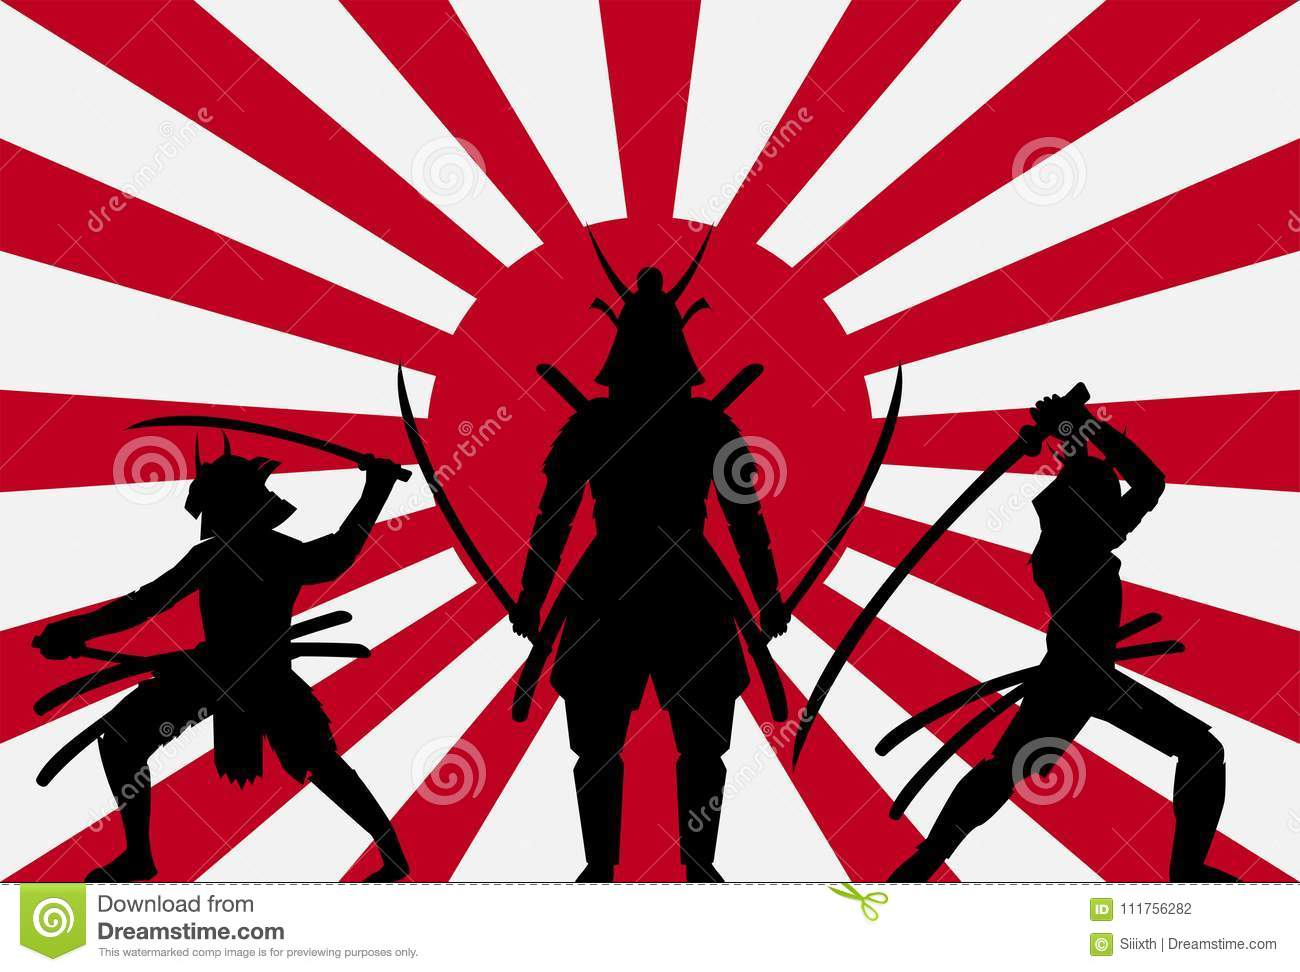 silhouette-samurai-rising-sun-japan-flag-111756282.jpg